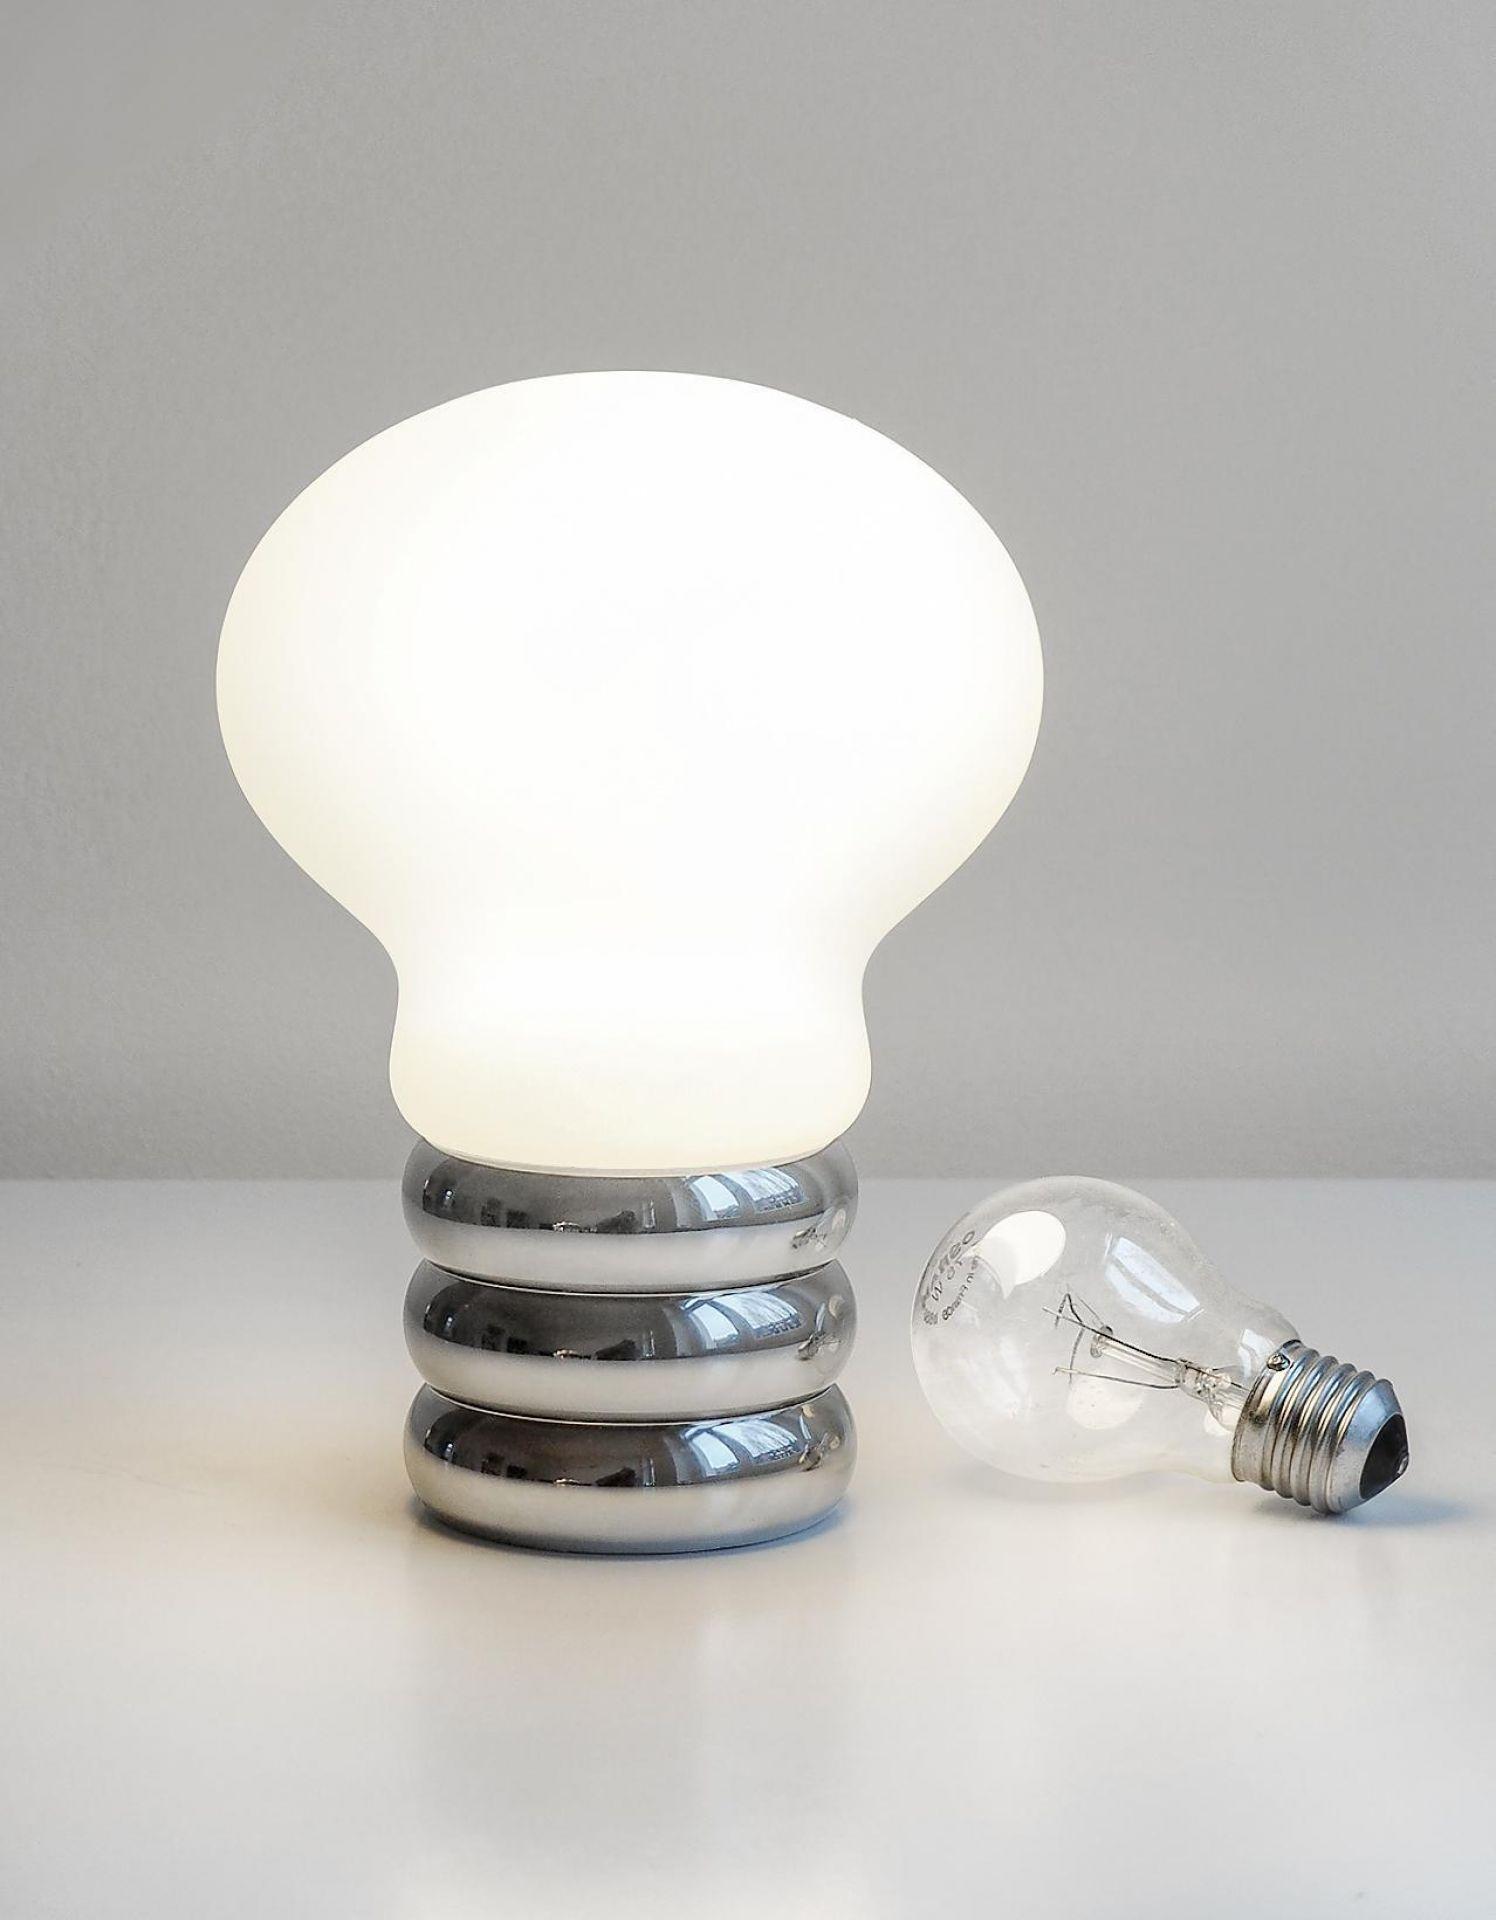 b.bulb Battery lamp / Table lamp with USB Ingo Maurer